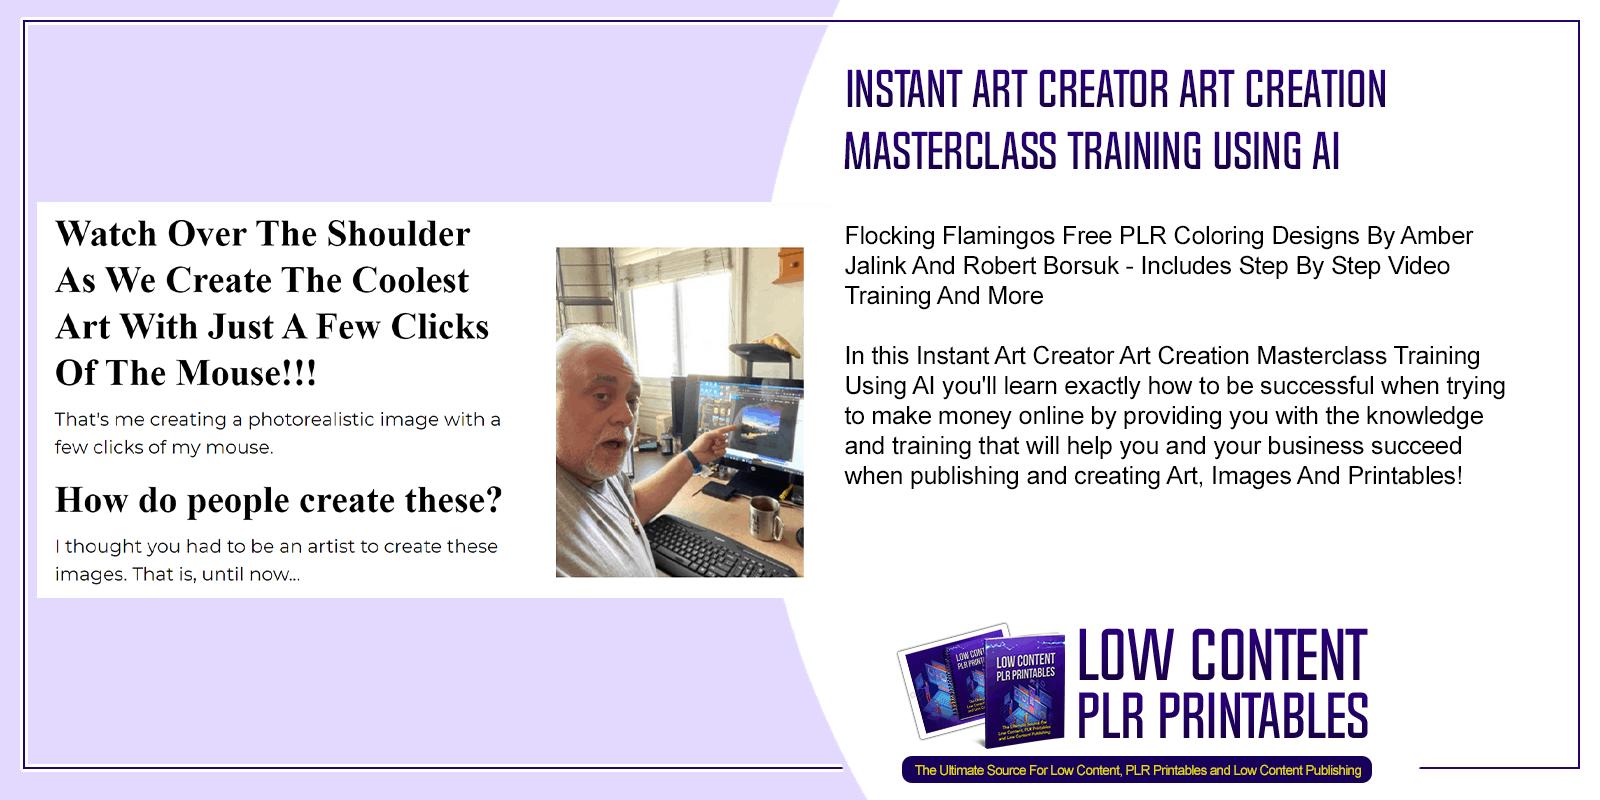 Instant Art Creator Art Creation Masterclass Training Using AI